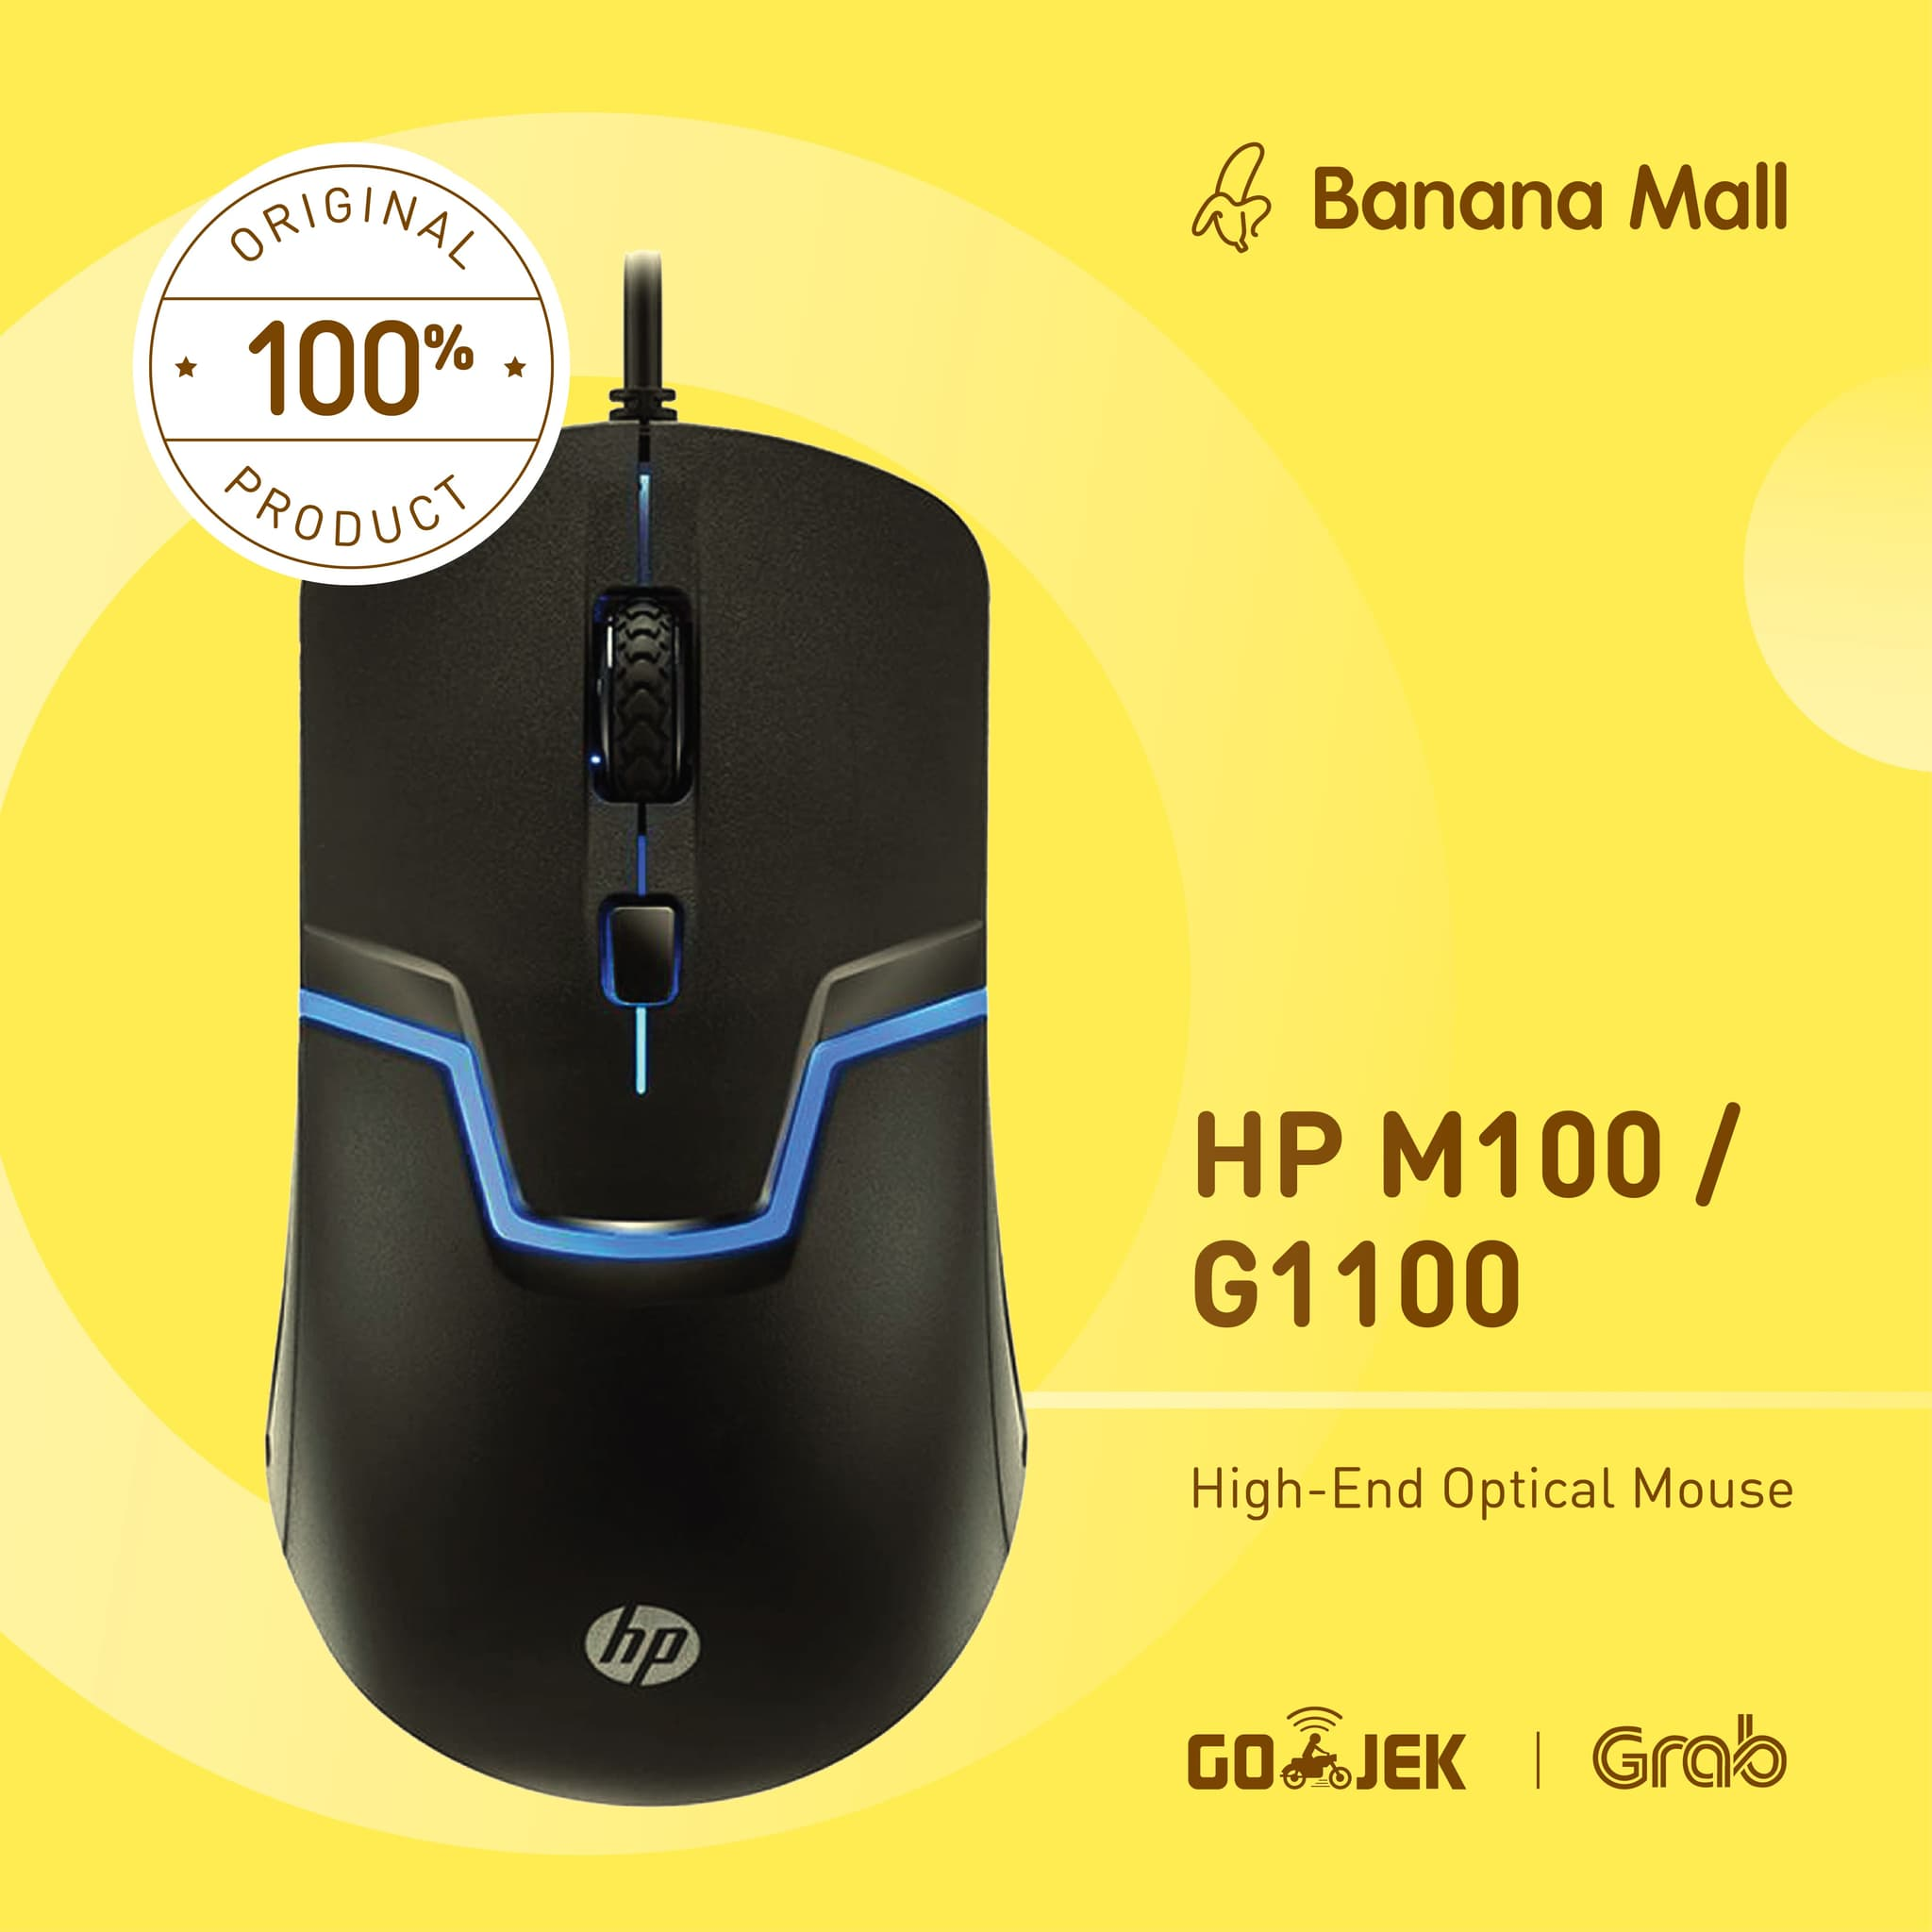 Jual 100 Original Hp Gaming Mouse M100 G1100 Banana Mall Tokopedia